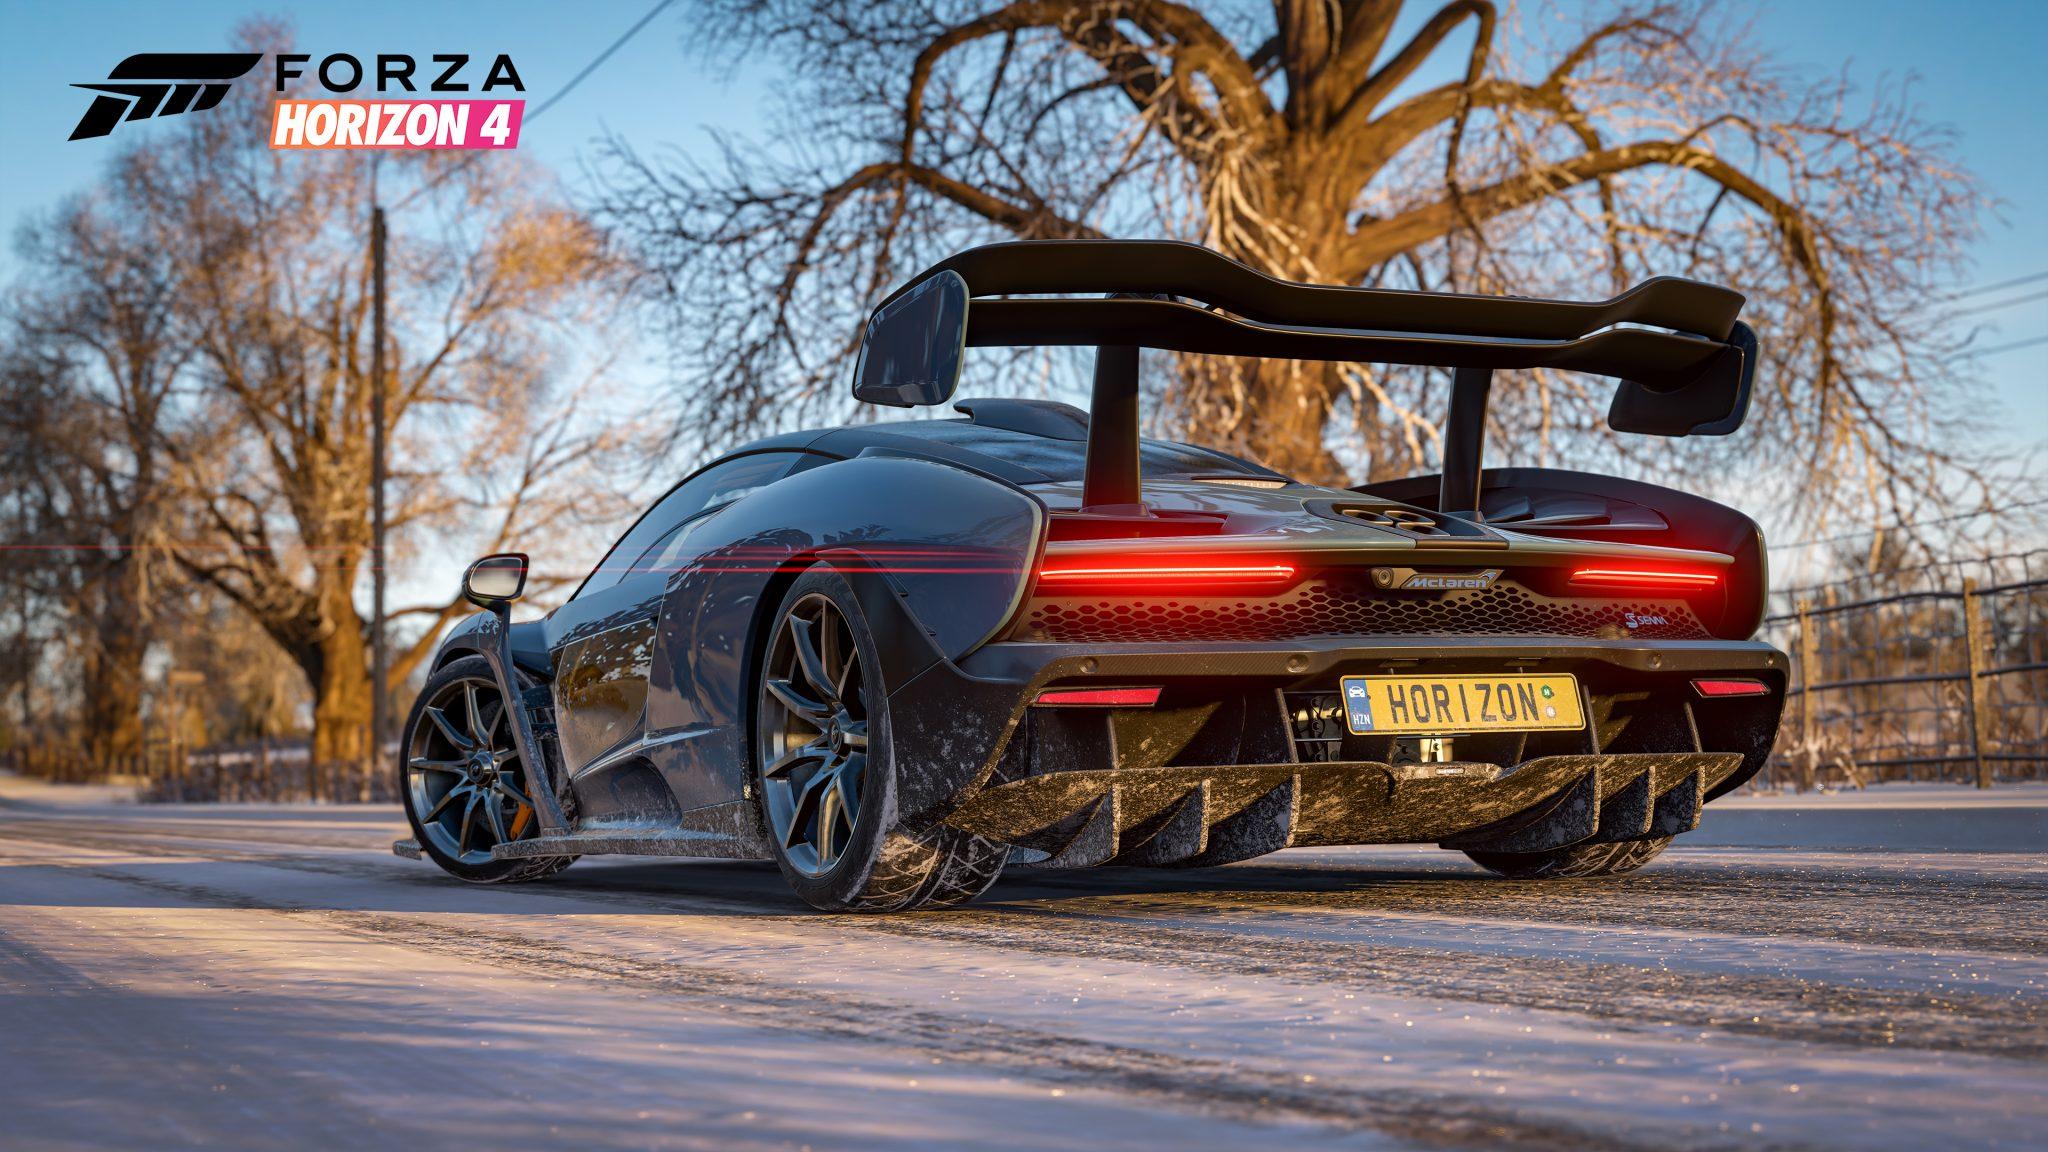 Forza Horizon 4 FH4 Xbox One X PC Ultimate Review Test Kritik Senna